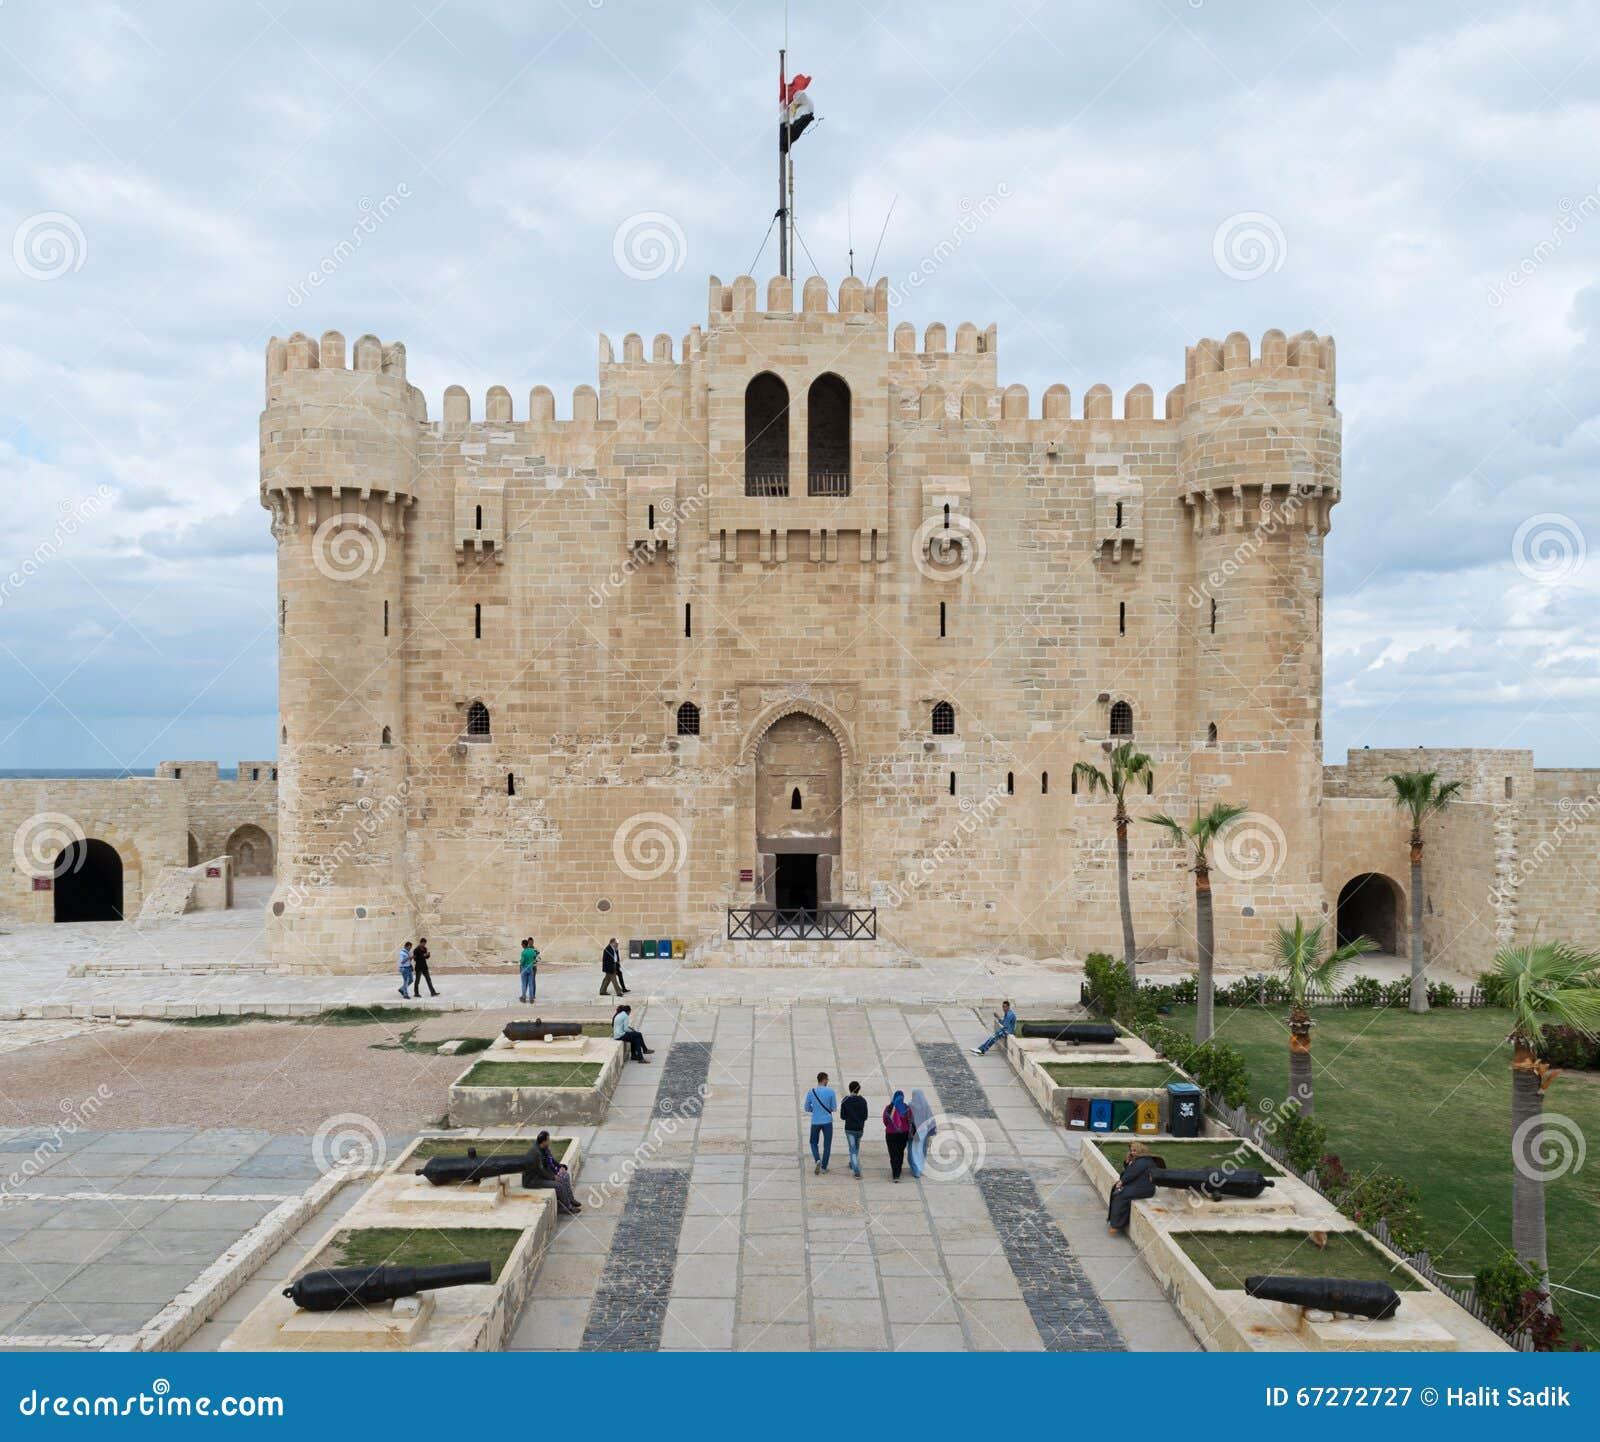 Alexandria Egypt December 3 2015 Qaitbay Castle